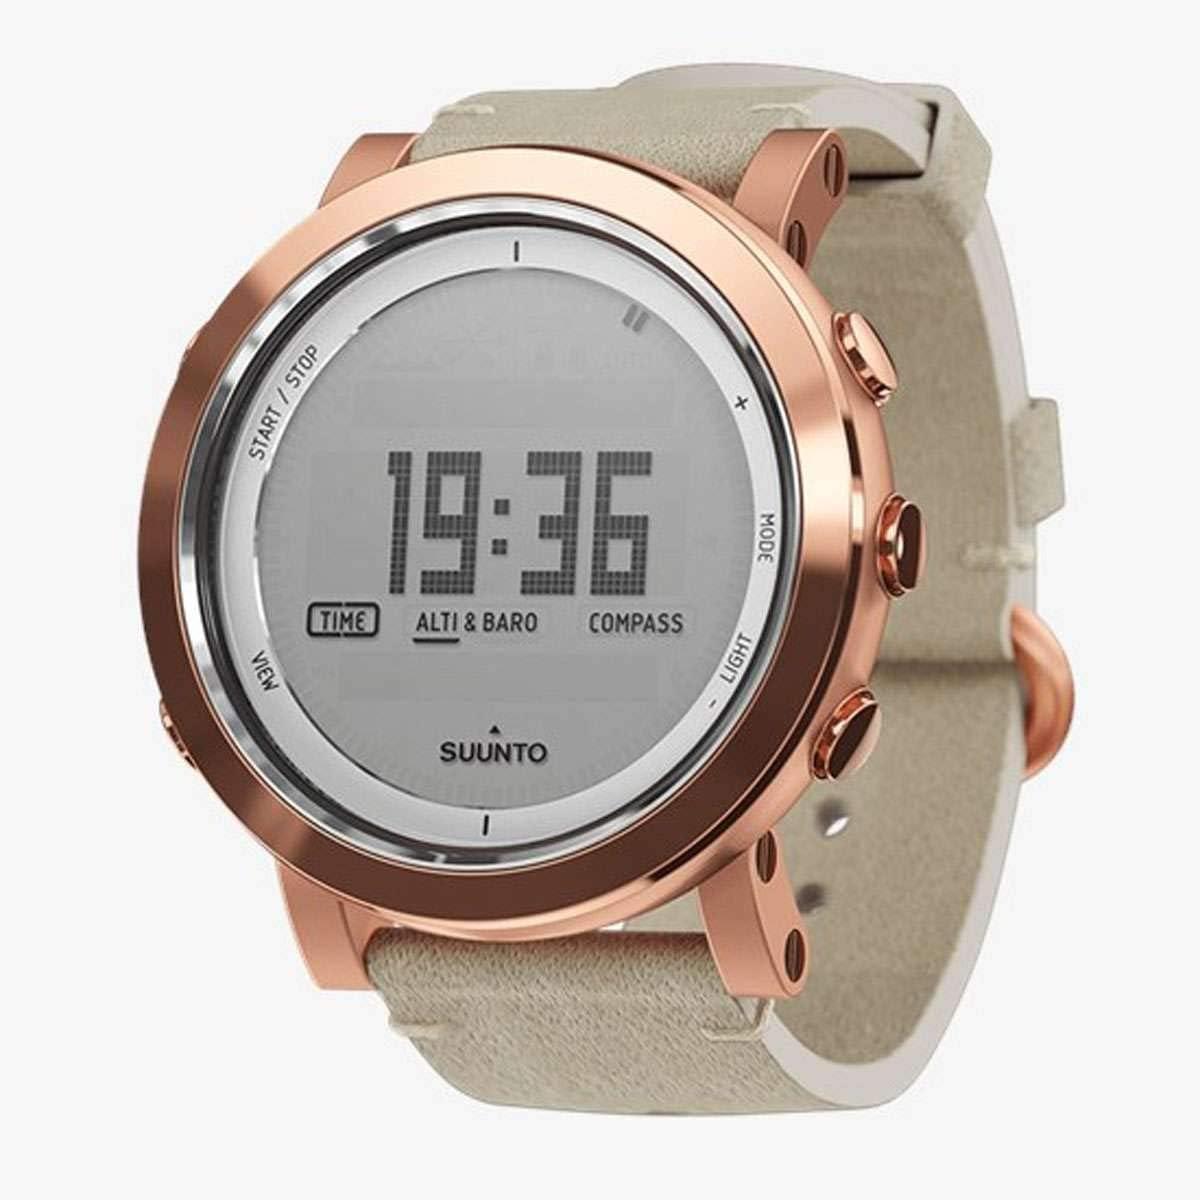 Watch Suunto Essential Ceramic COPPER - Leather Strap, Sapphire Glass, Altimeter Barometer Compass